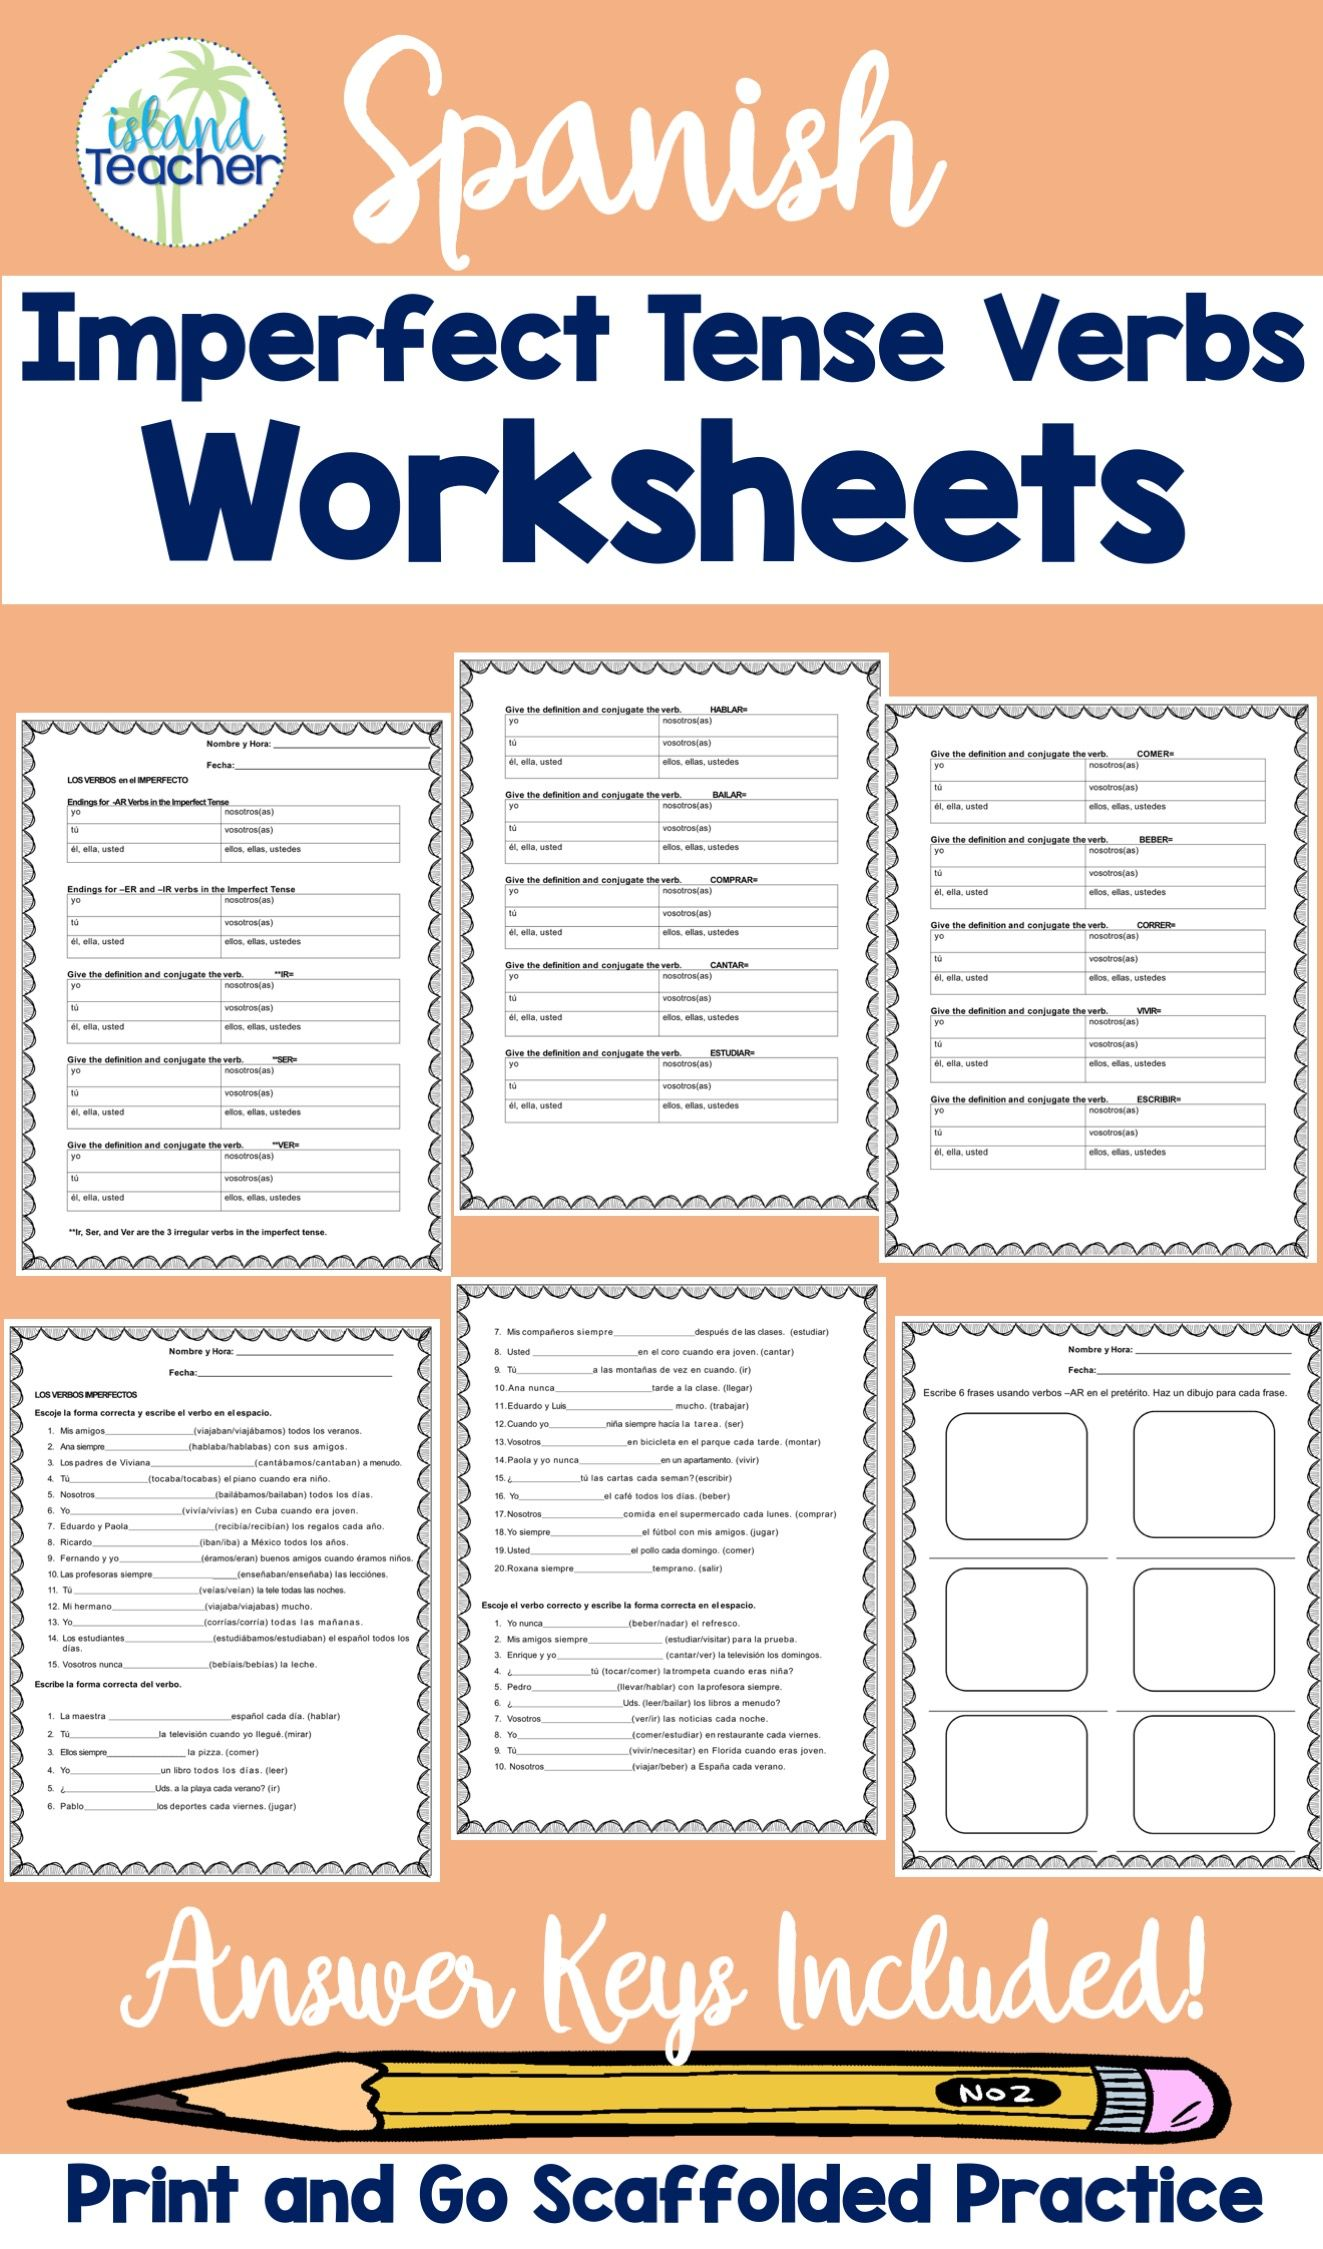 Spanish Imperfect Tense Verbs Worksheets Verb Worksheets Verb Practice Elementary Spanish Lessons [ 2249 x 1323 Pixel ]